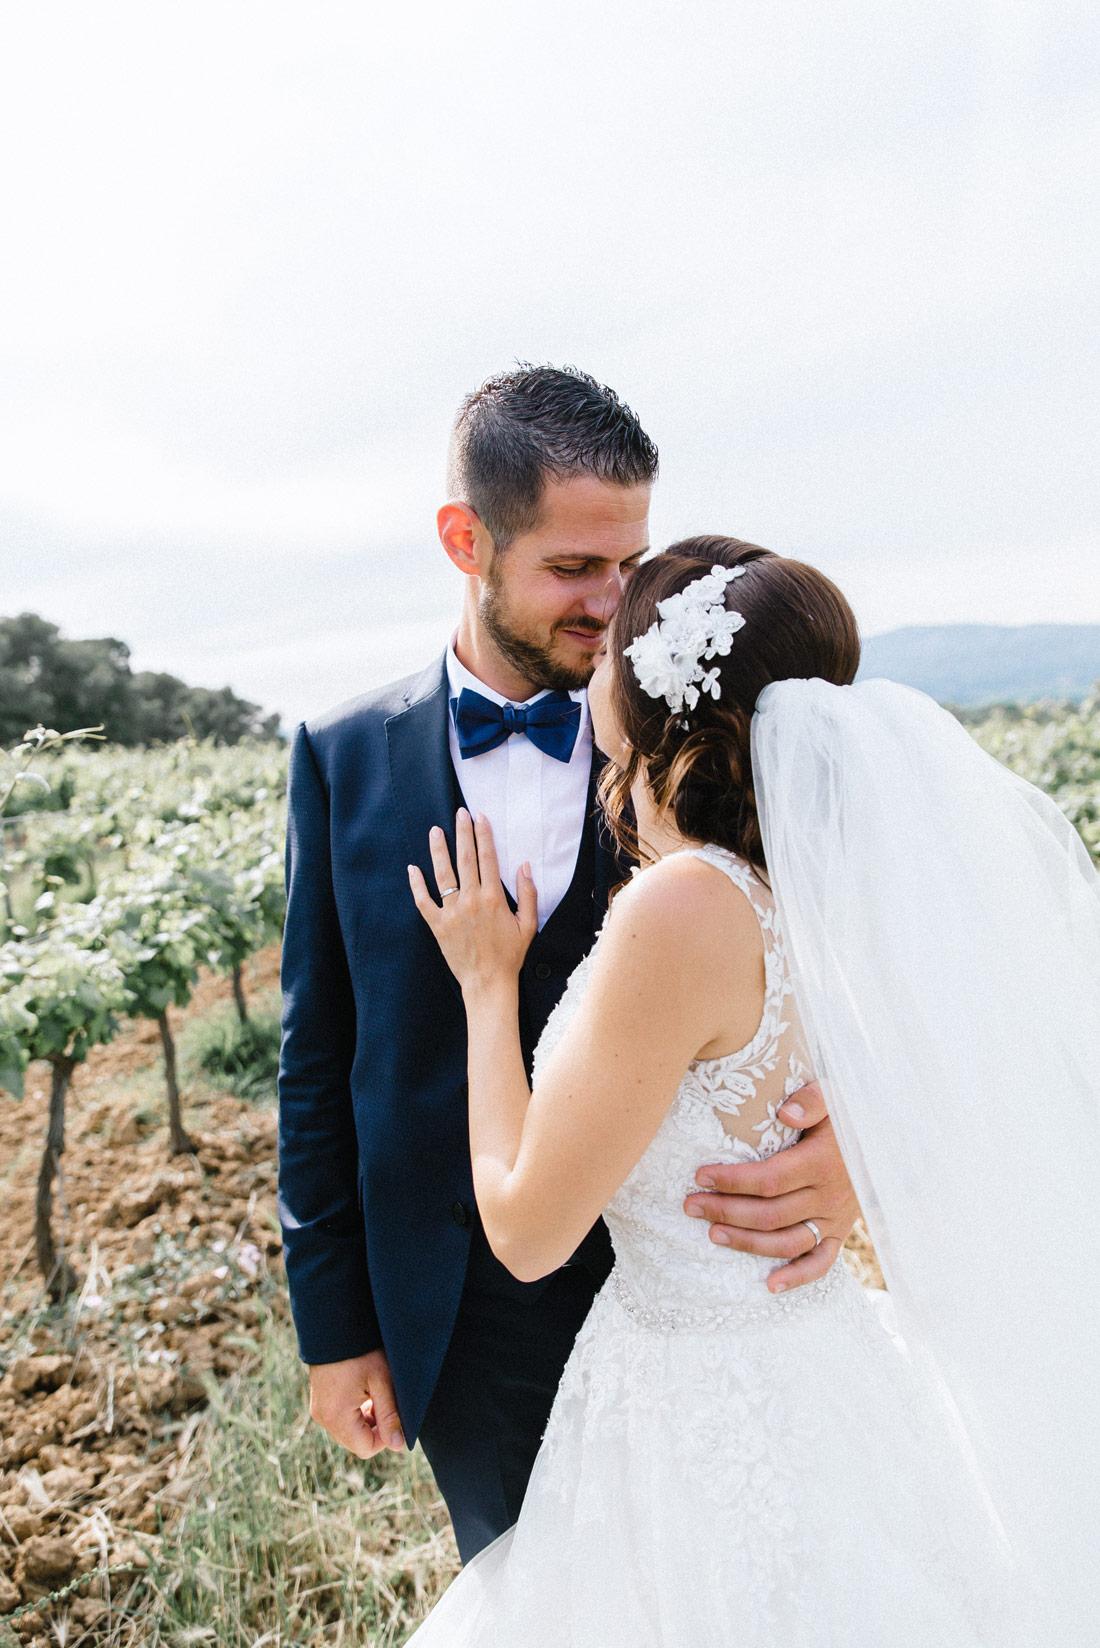 mariagelpca94